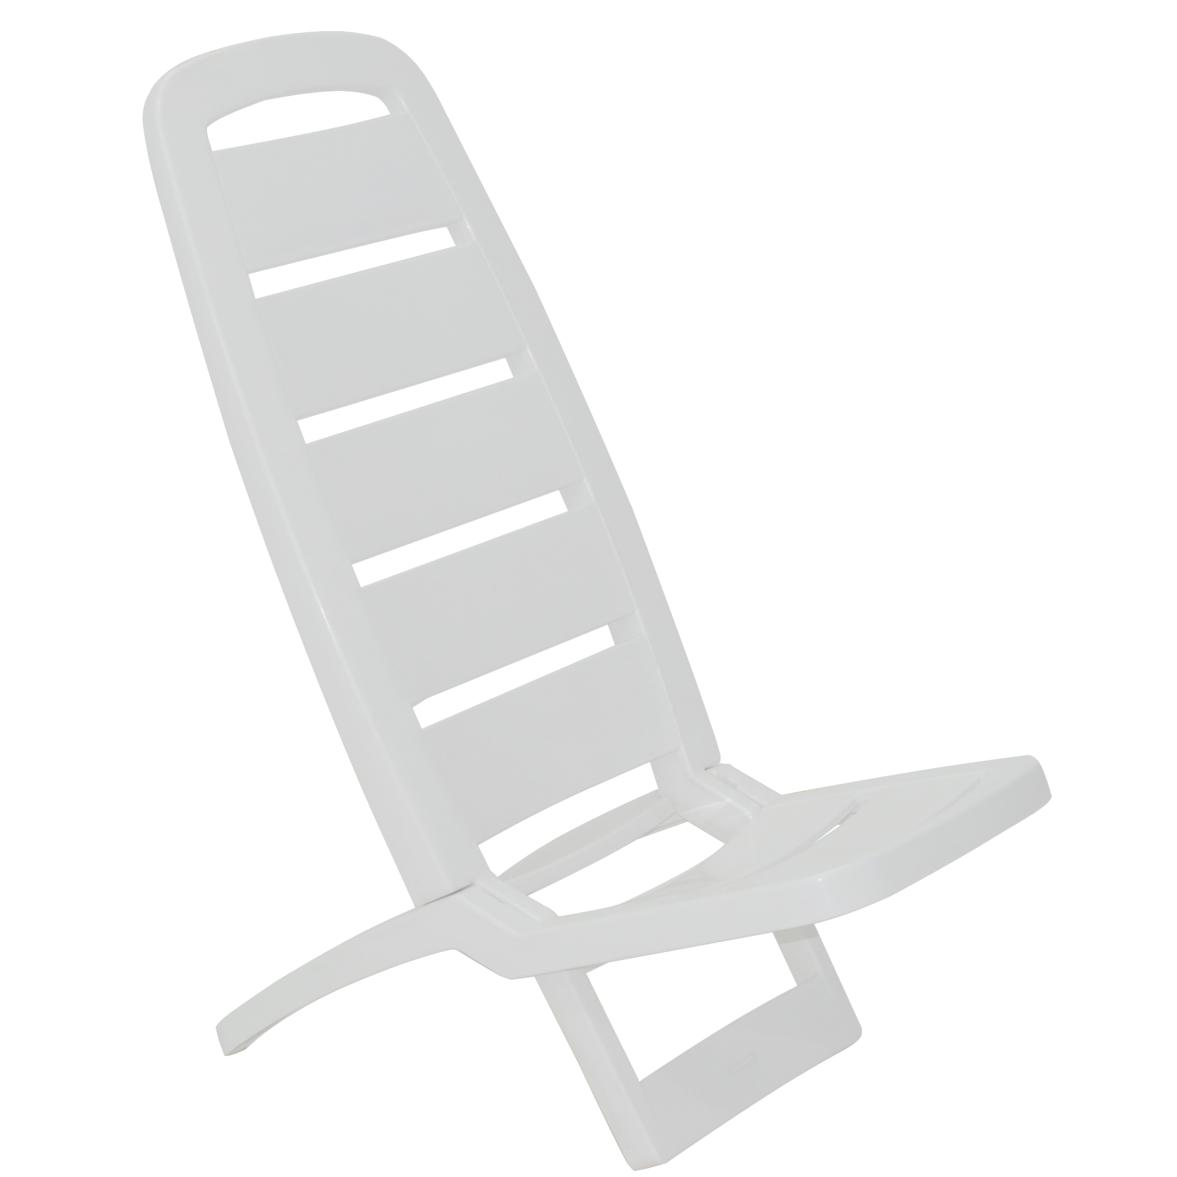 Cadeira de Praia Guaruja Branca 92051010 - Tramontina